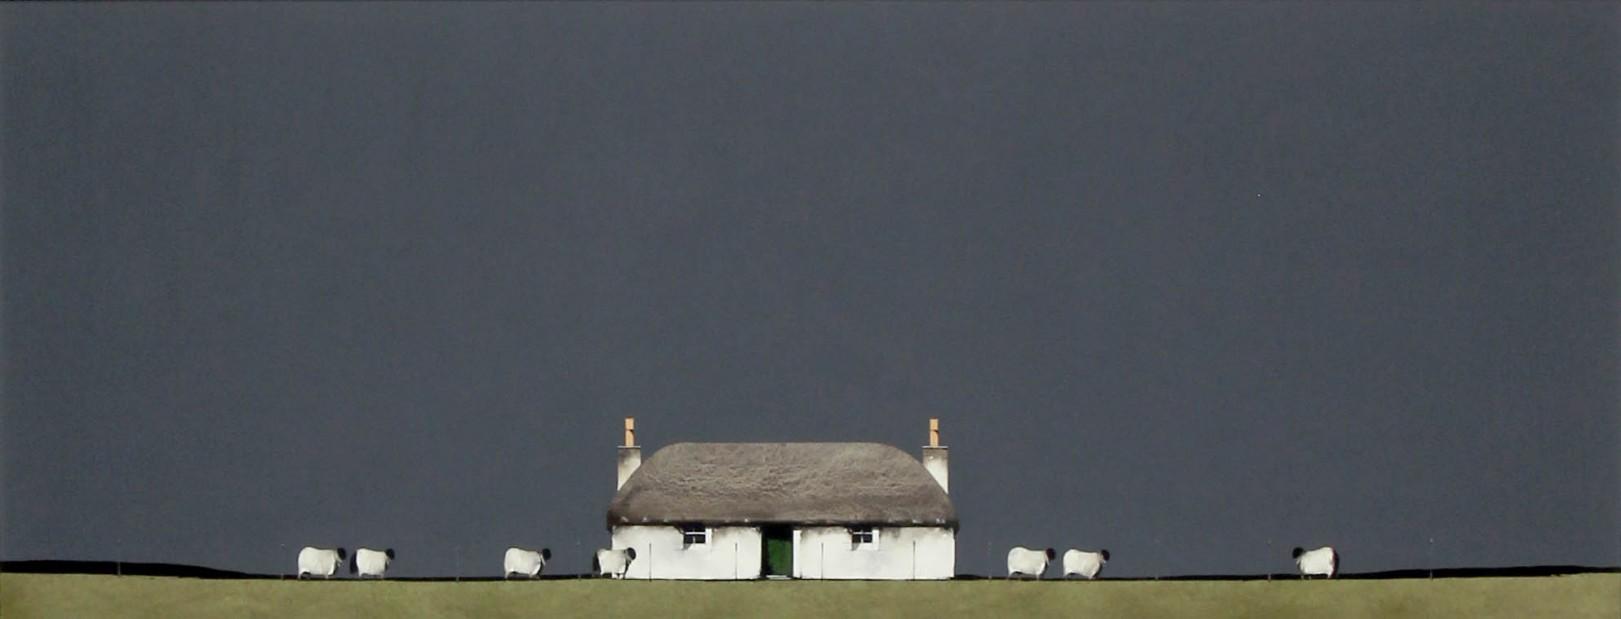 Ron Lawson_Original_Watercolour and Gouache_Crofter's House & Sheep_Image 15x38 (3)